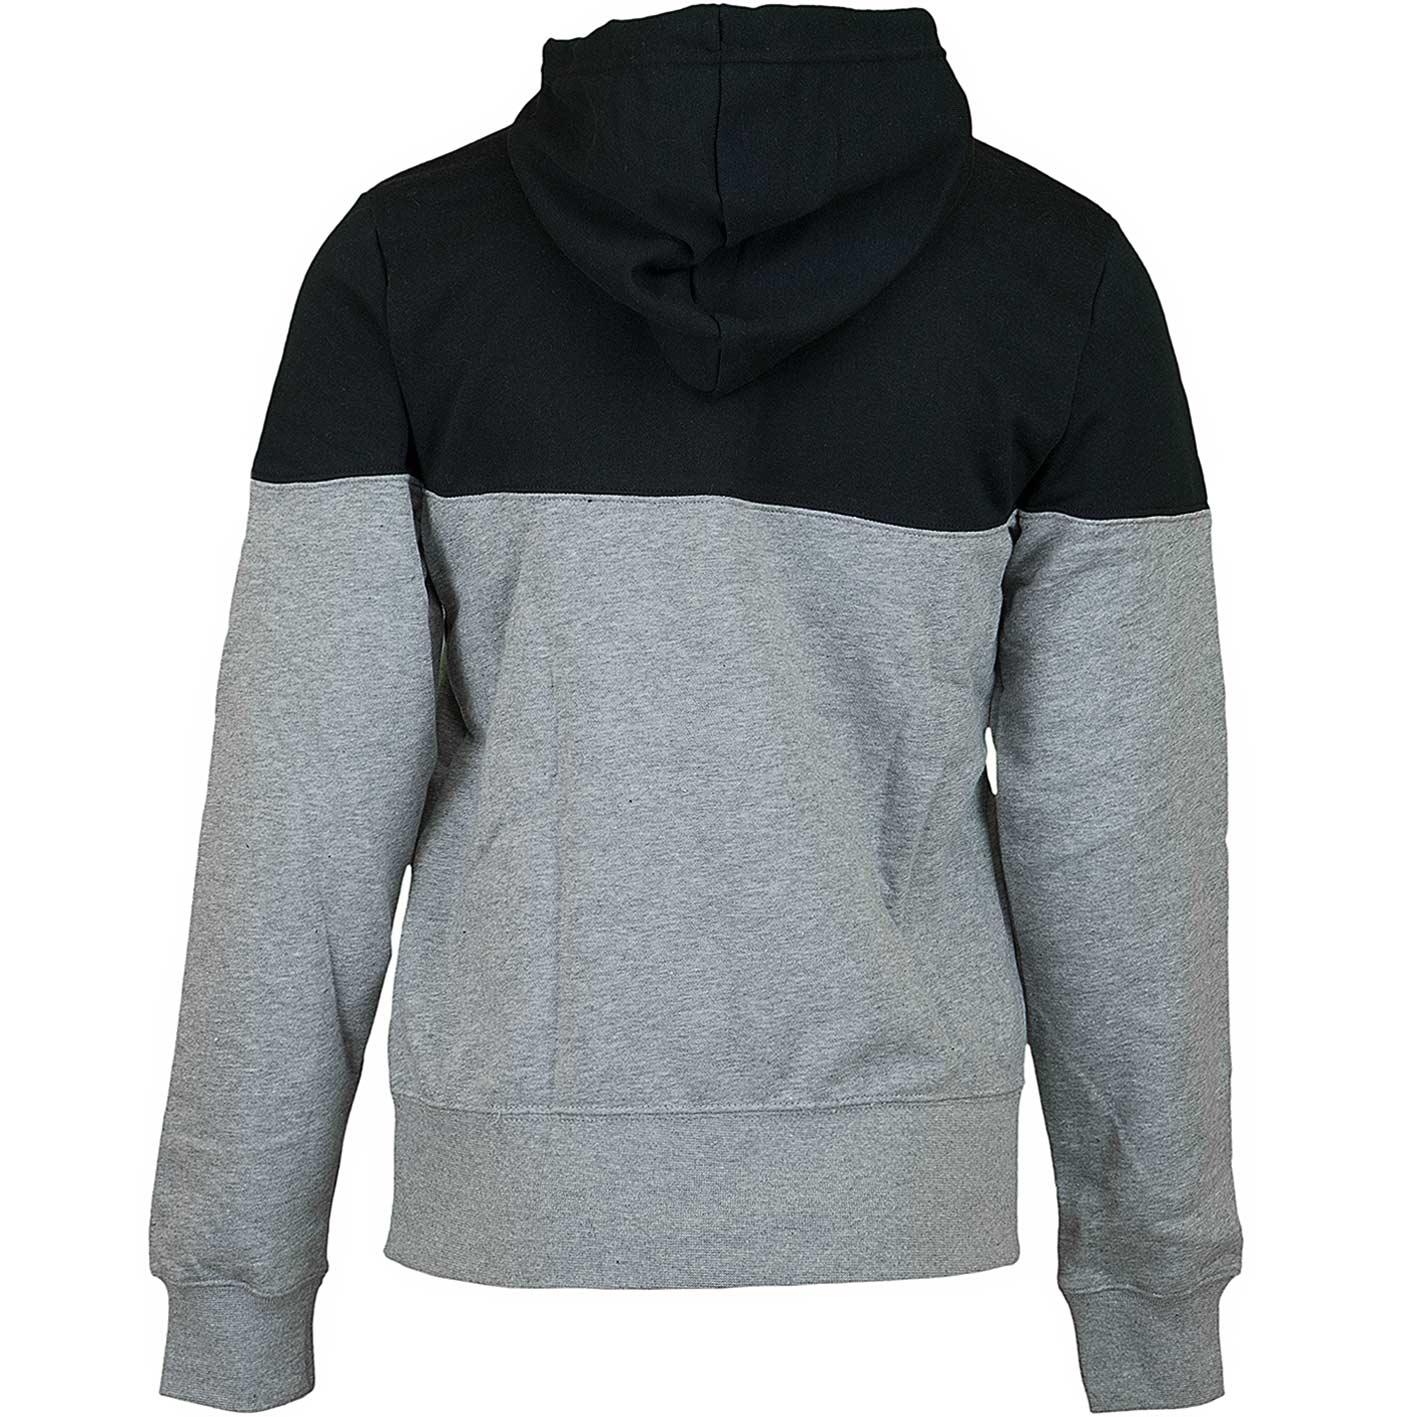 huge selection of 06c5e 222e4 Nike Damen Hoody Heritage Fleece grau/schwarz